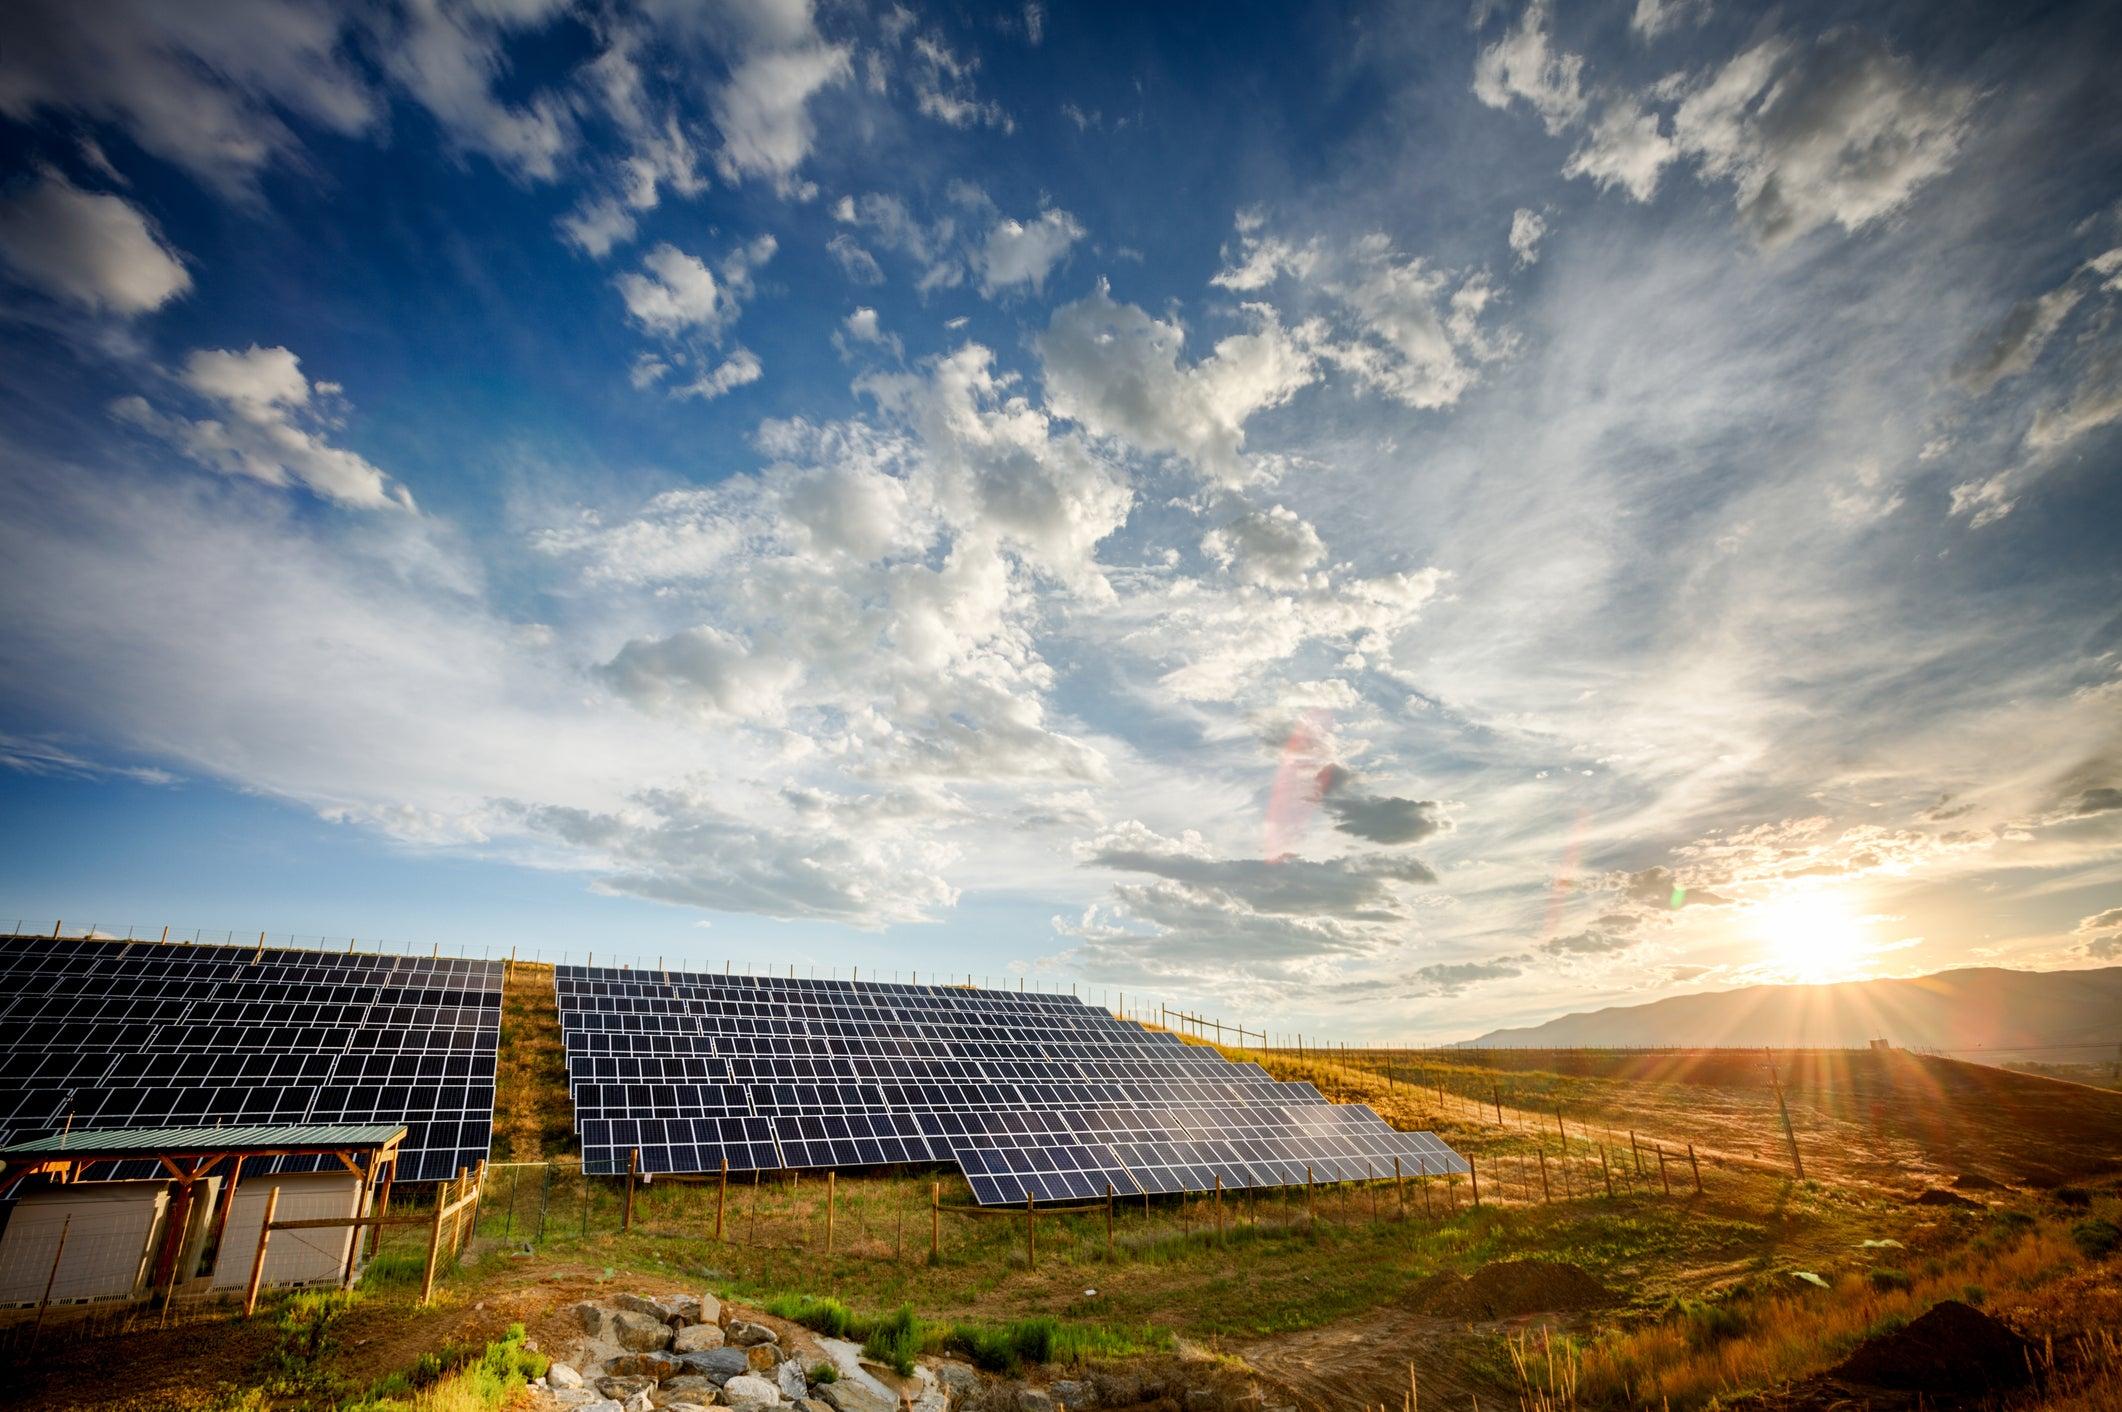 Why I Still Love That Scorching Hot Solar Power Stock - Motley Fool